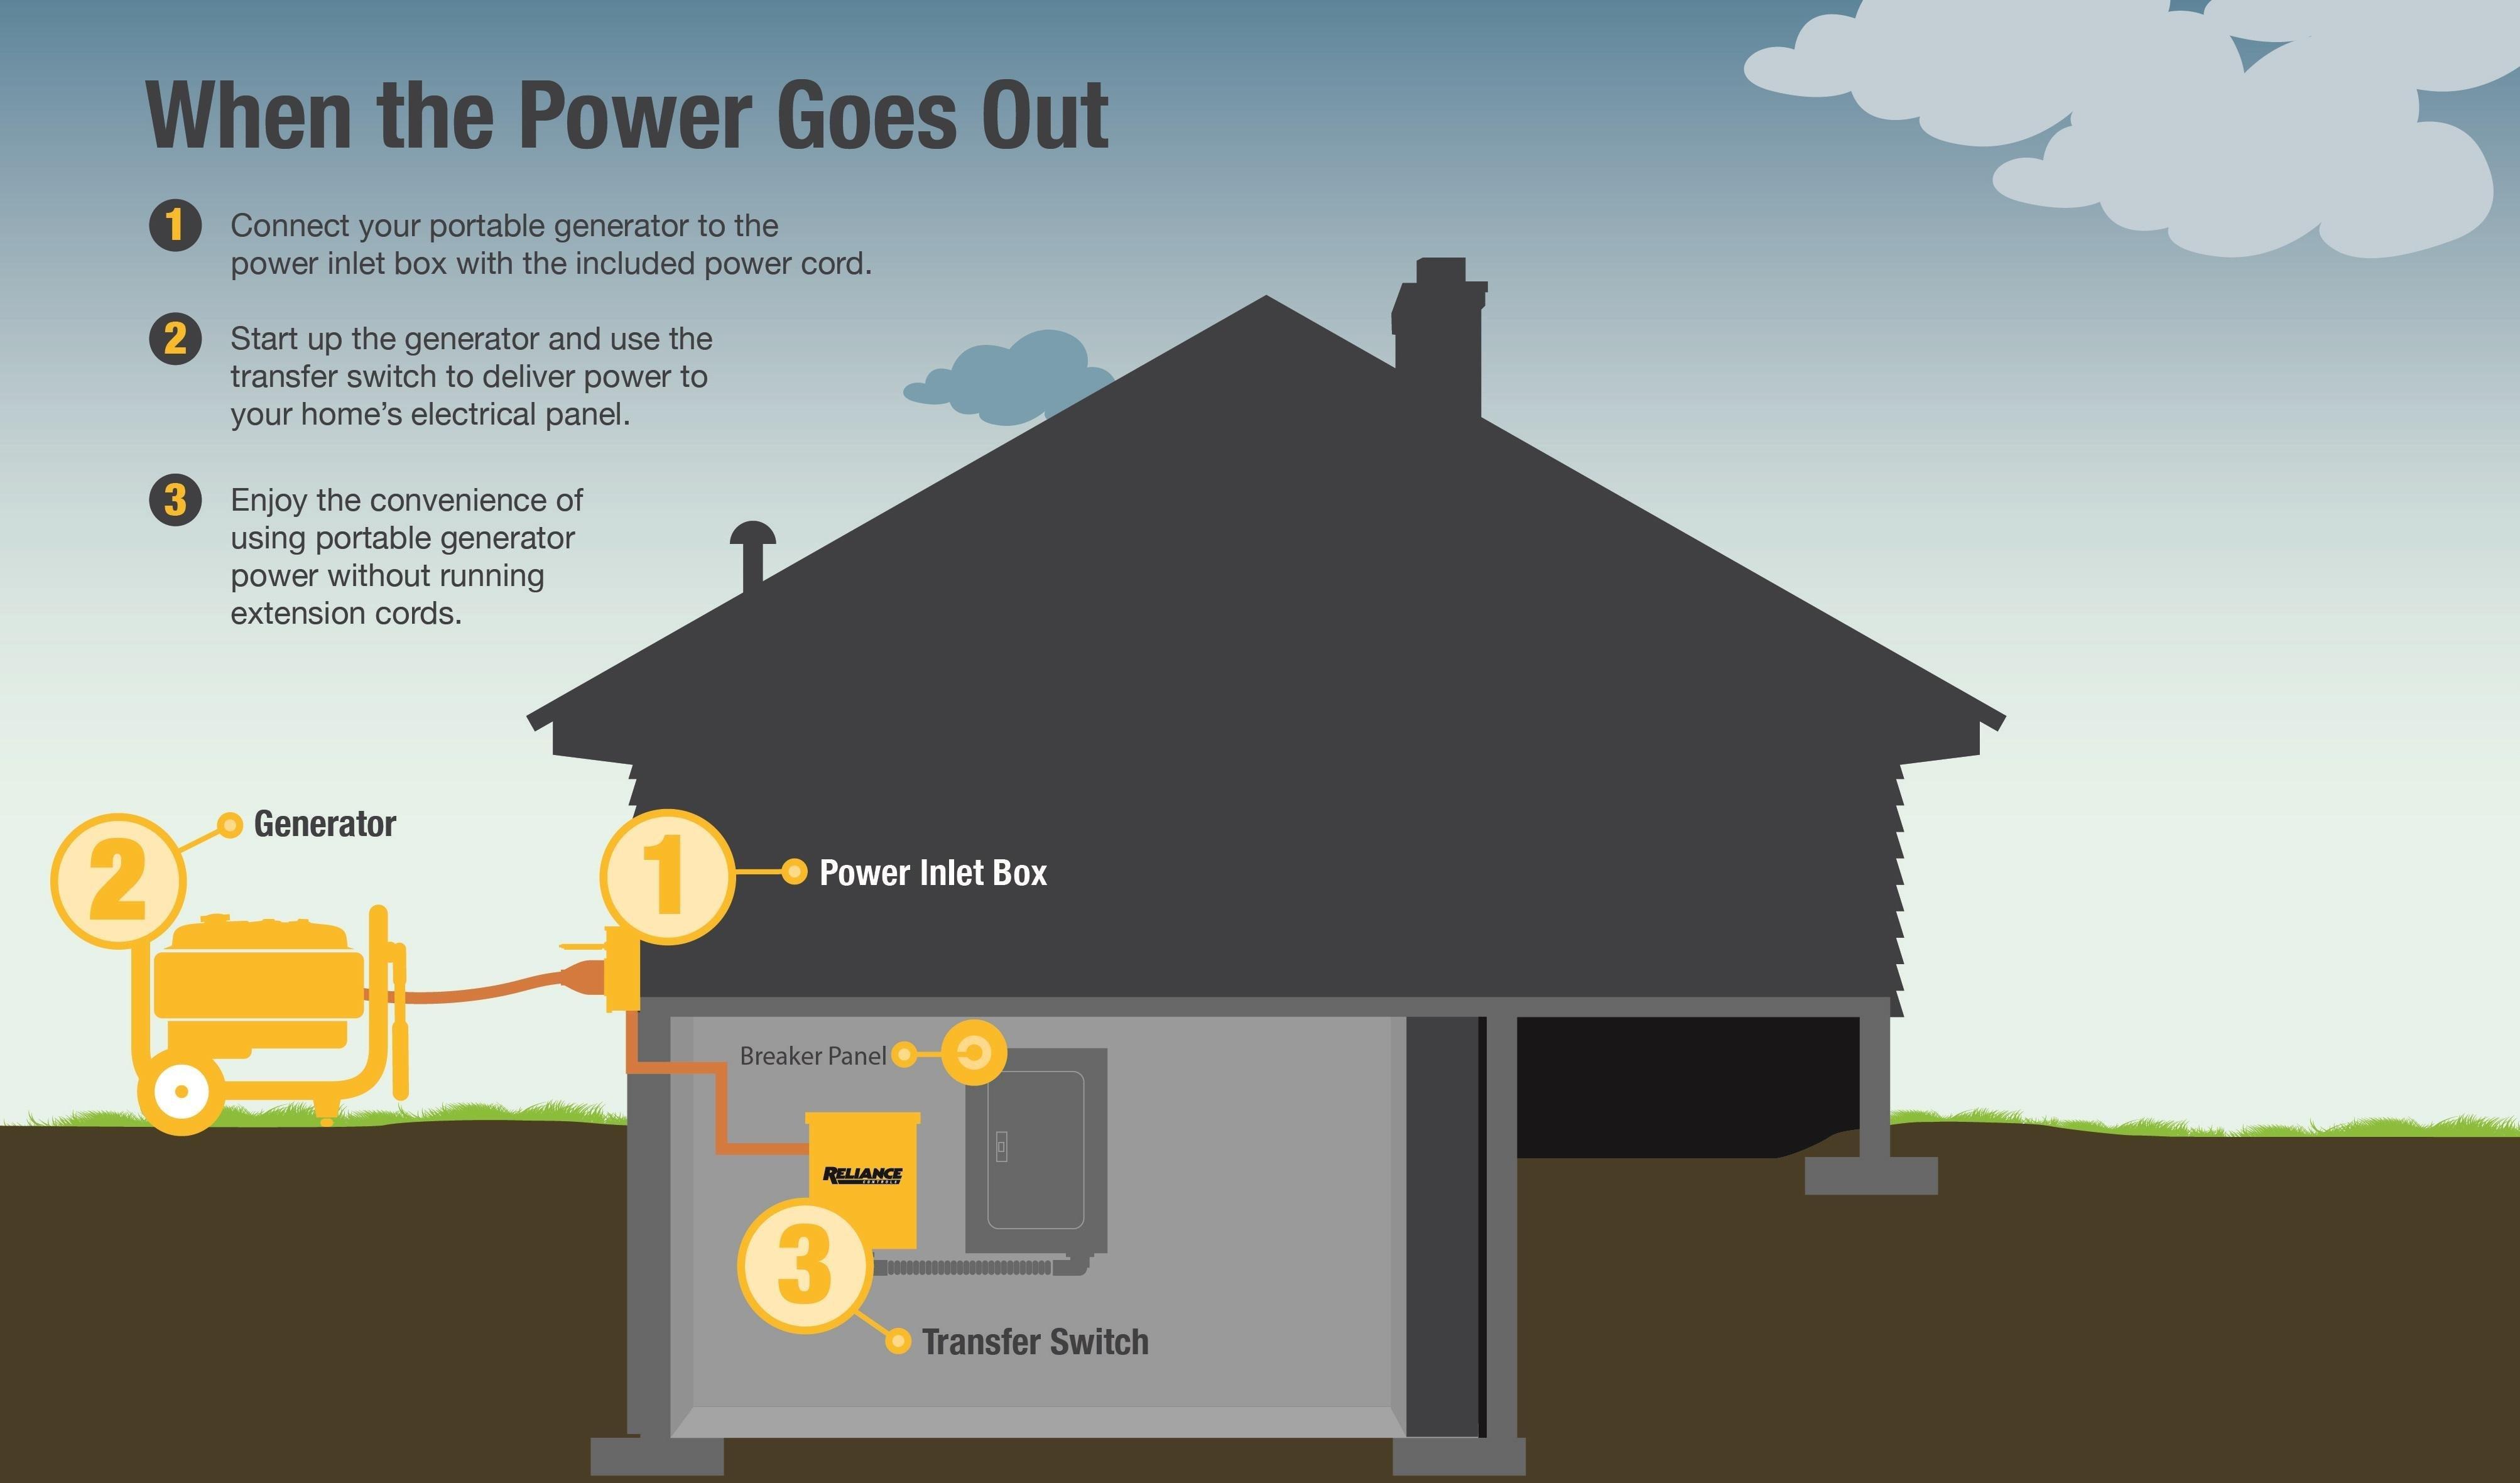 Reliance Controls Corporation PB30 30 Amp NEMA 3R Power Inlet Box for Generators